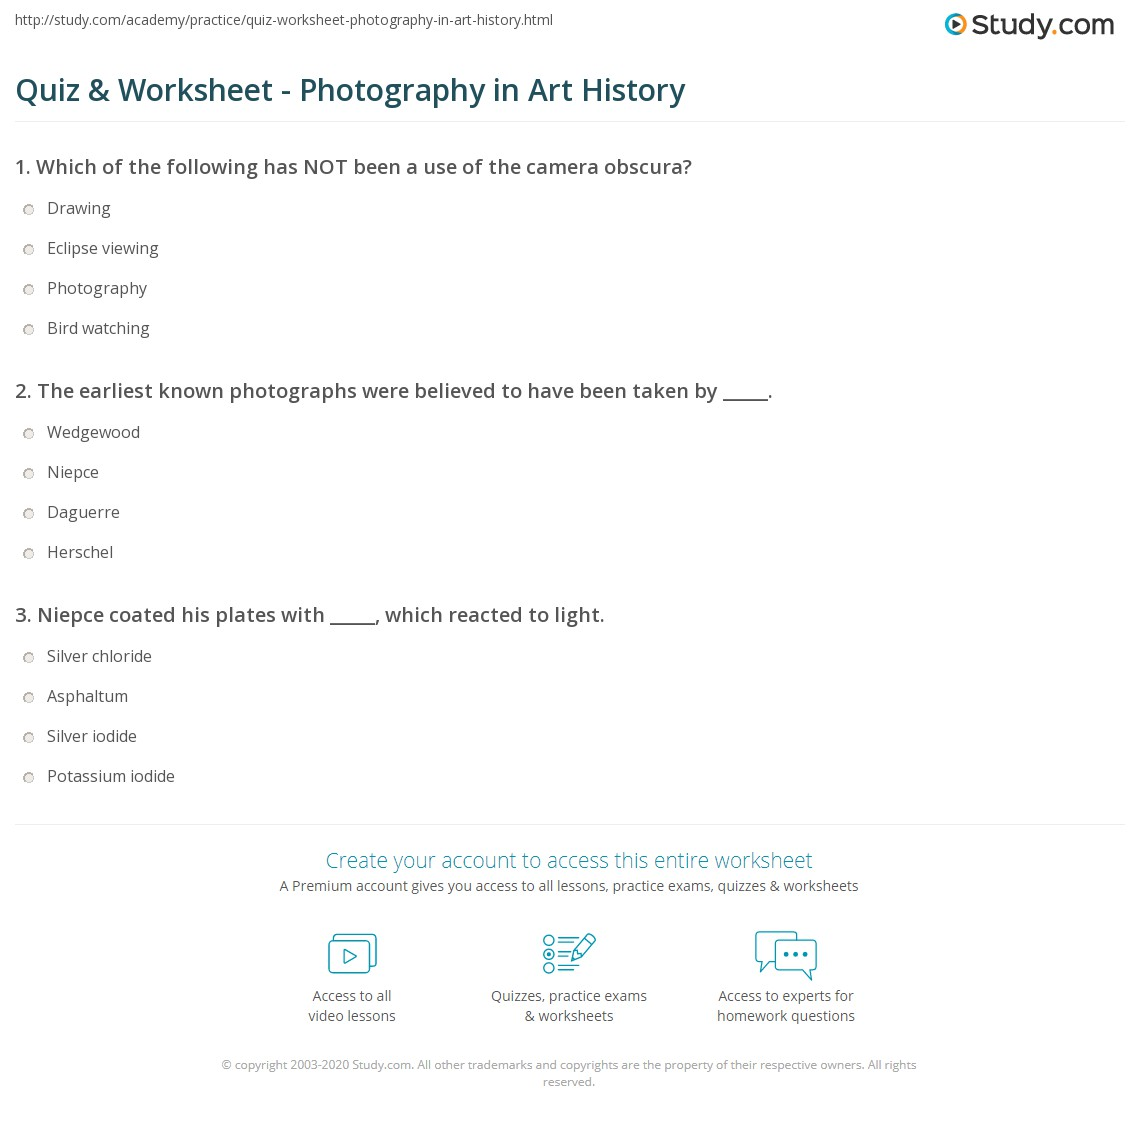 quiz worksheet photography in art history. Black Bedroom Furniture Sets. Home Design Ideas